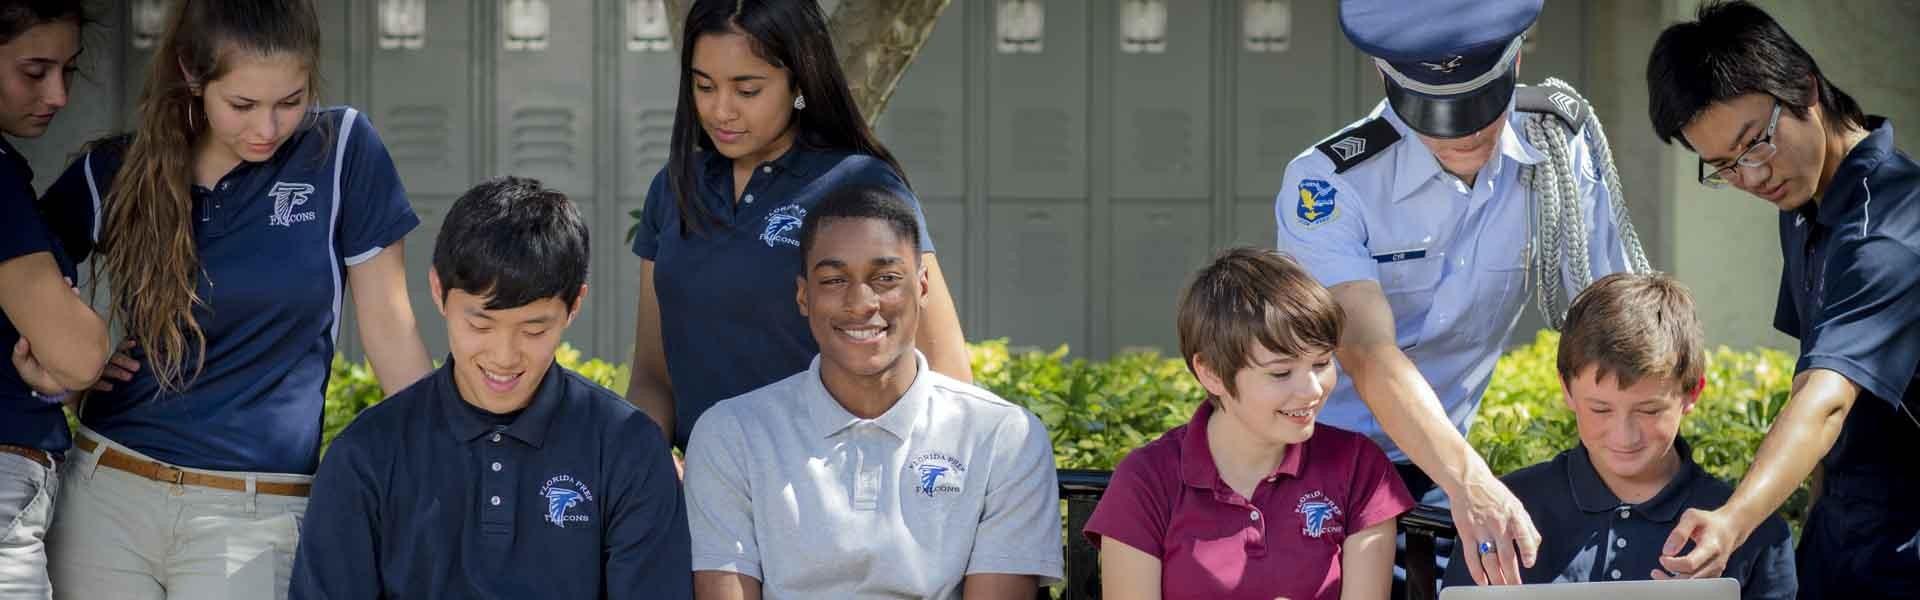 FloridaPreparatoryAcademy-Highschool-Florida-GroupPictureDiversity-MAin-Banner-2019